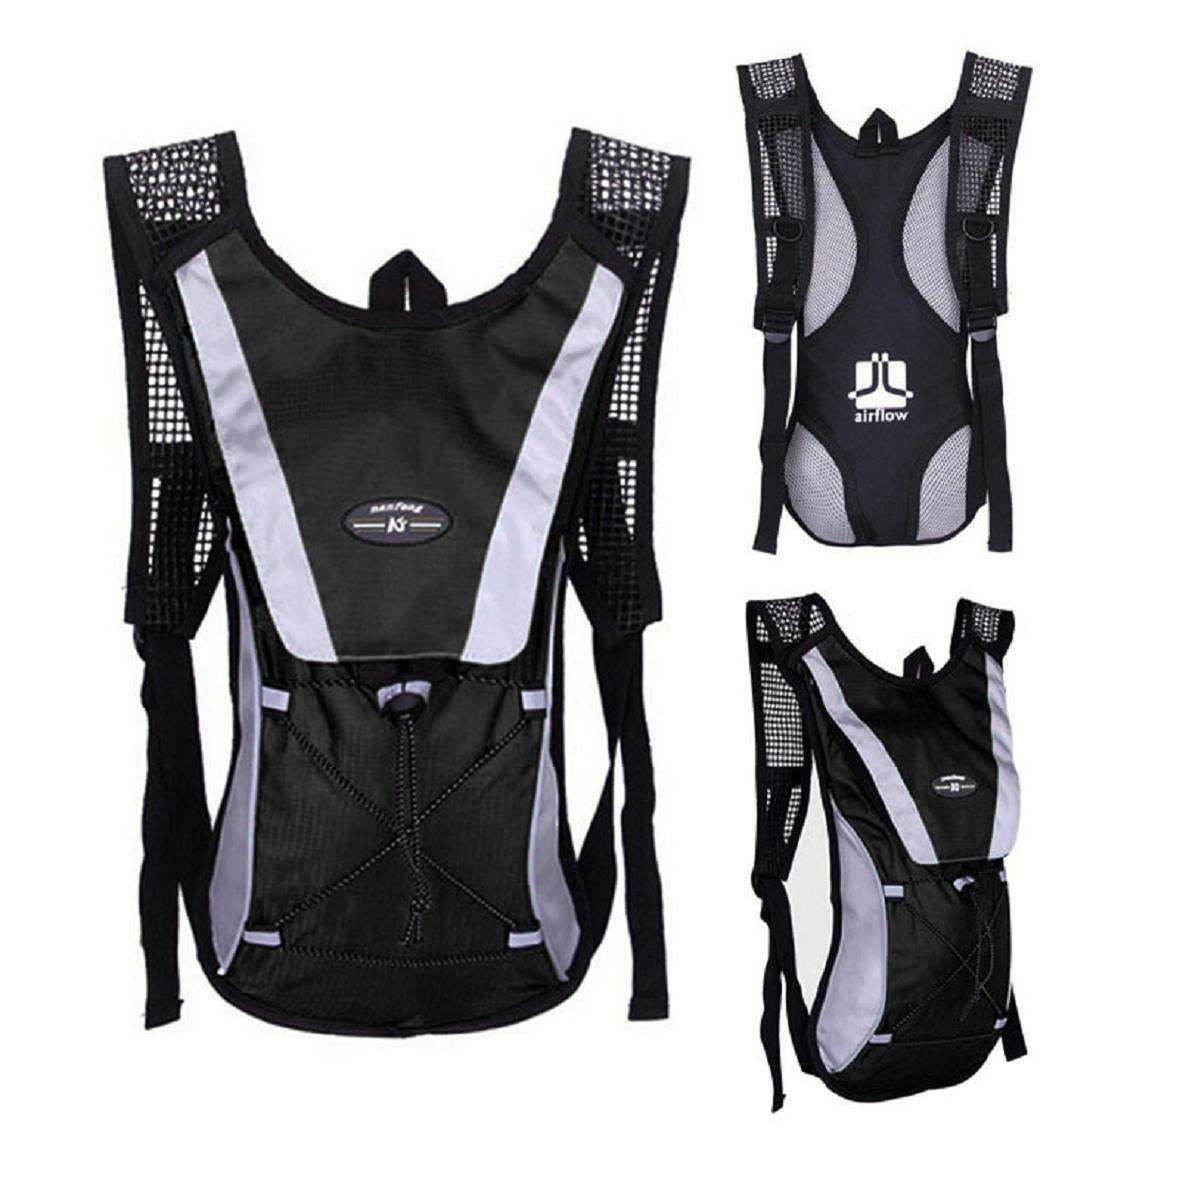 Susenstone/® Water Bladder Bag Backpack Black Hydration Packs Camelbak Hiking Camping 2L